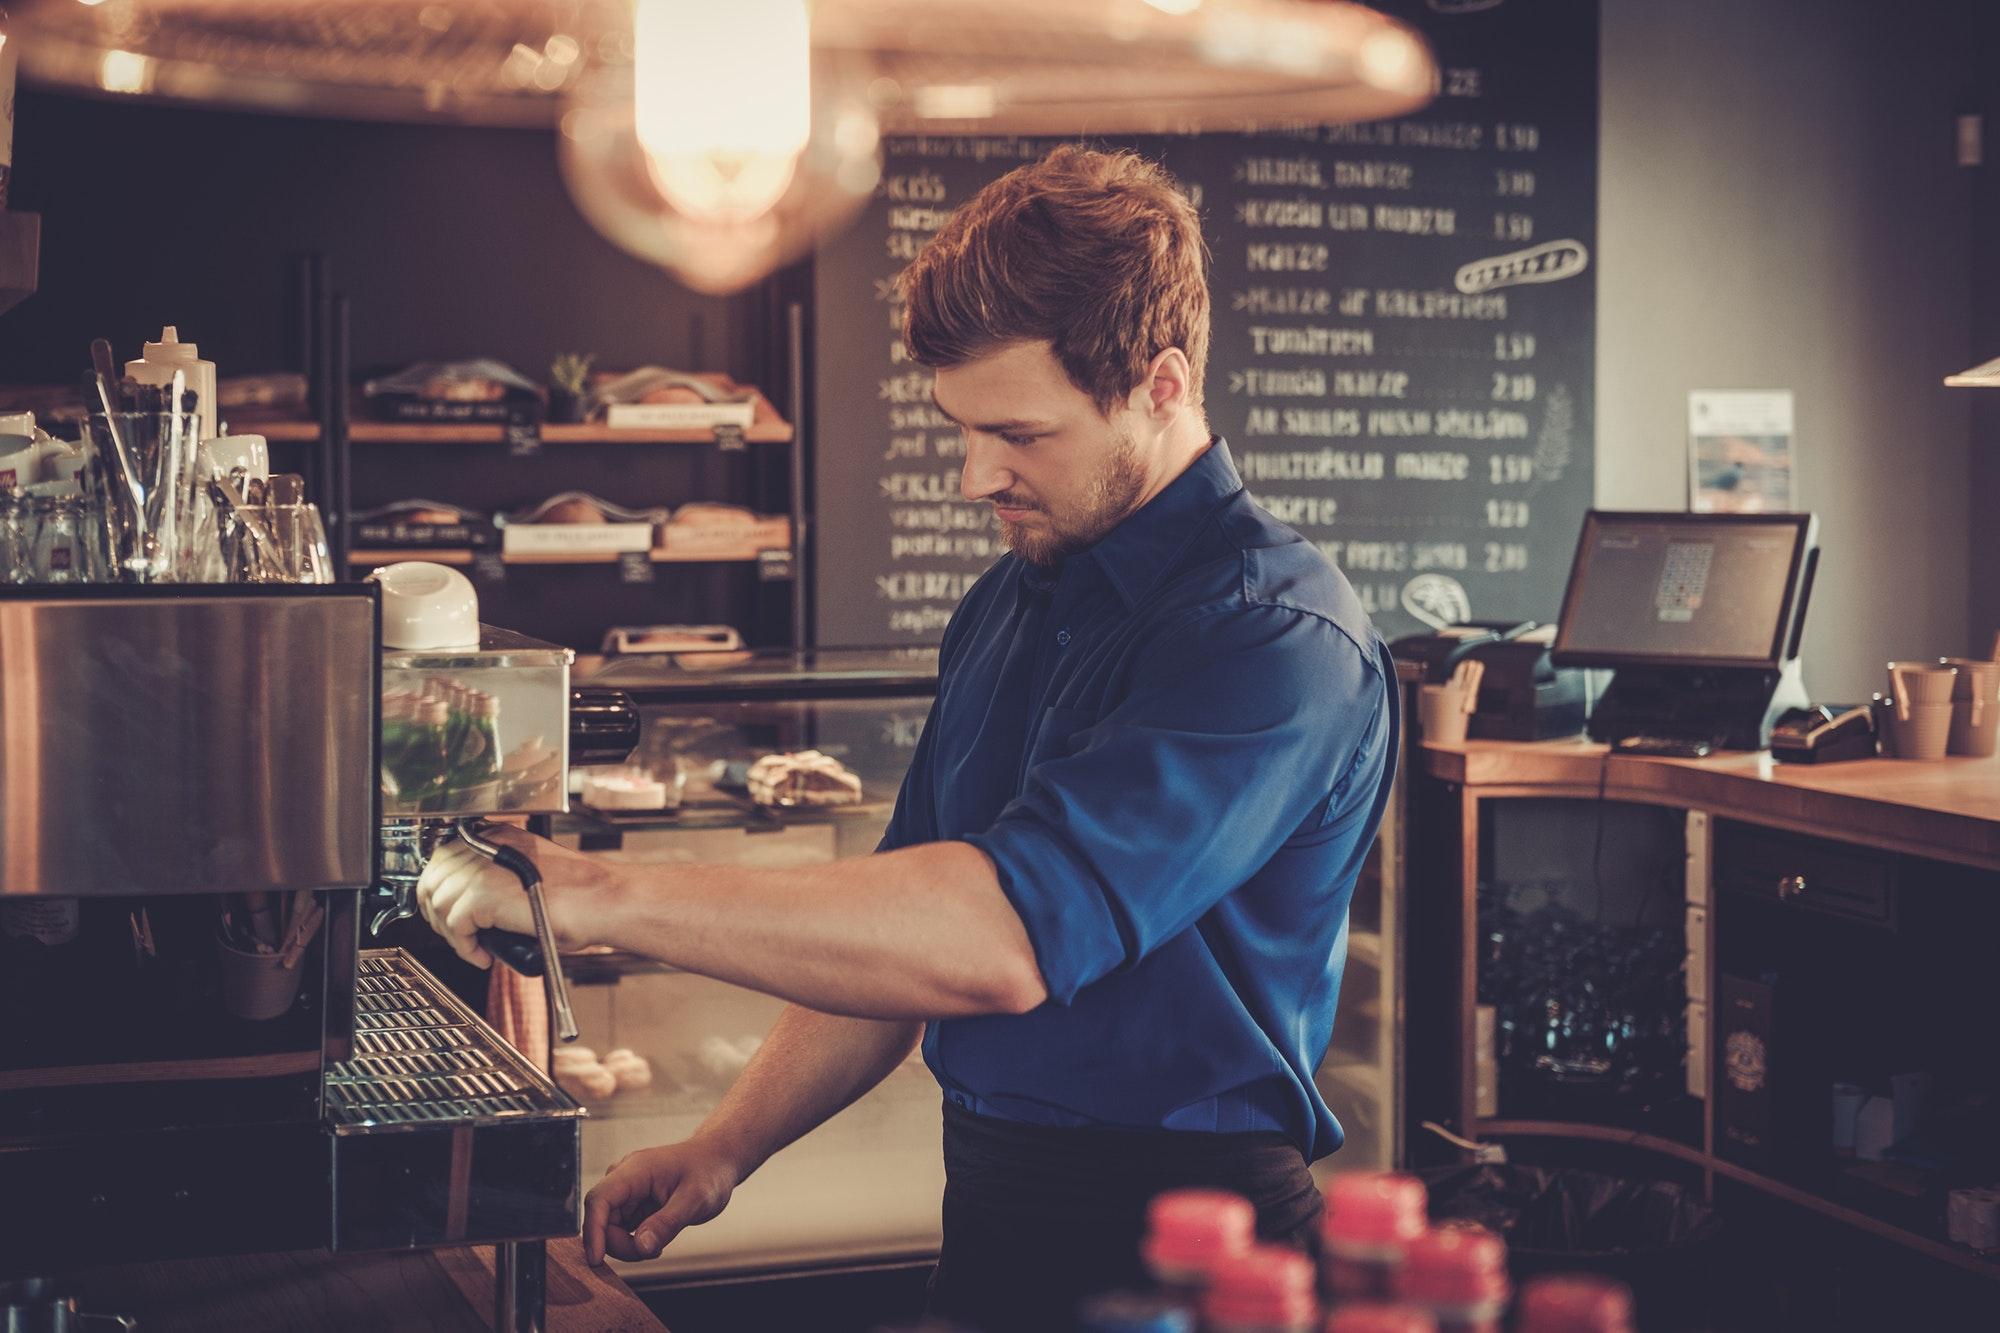 barista-preparing-cup-of-coffee-for-customer-in-coffee-shop-.jpg